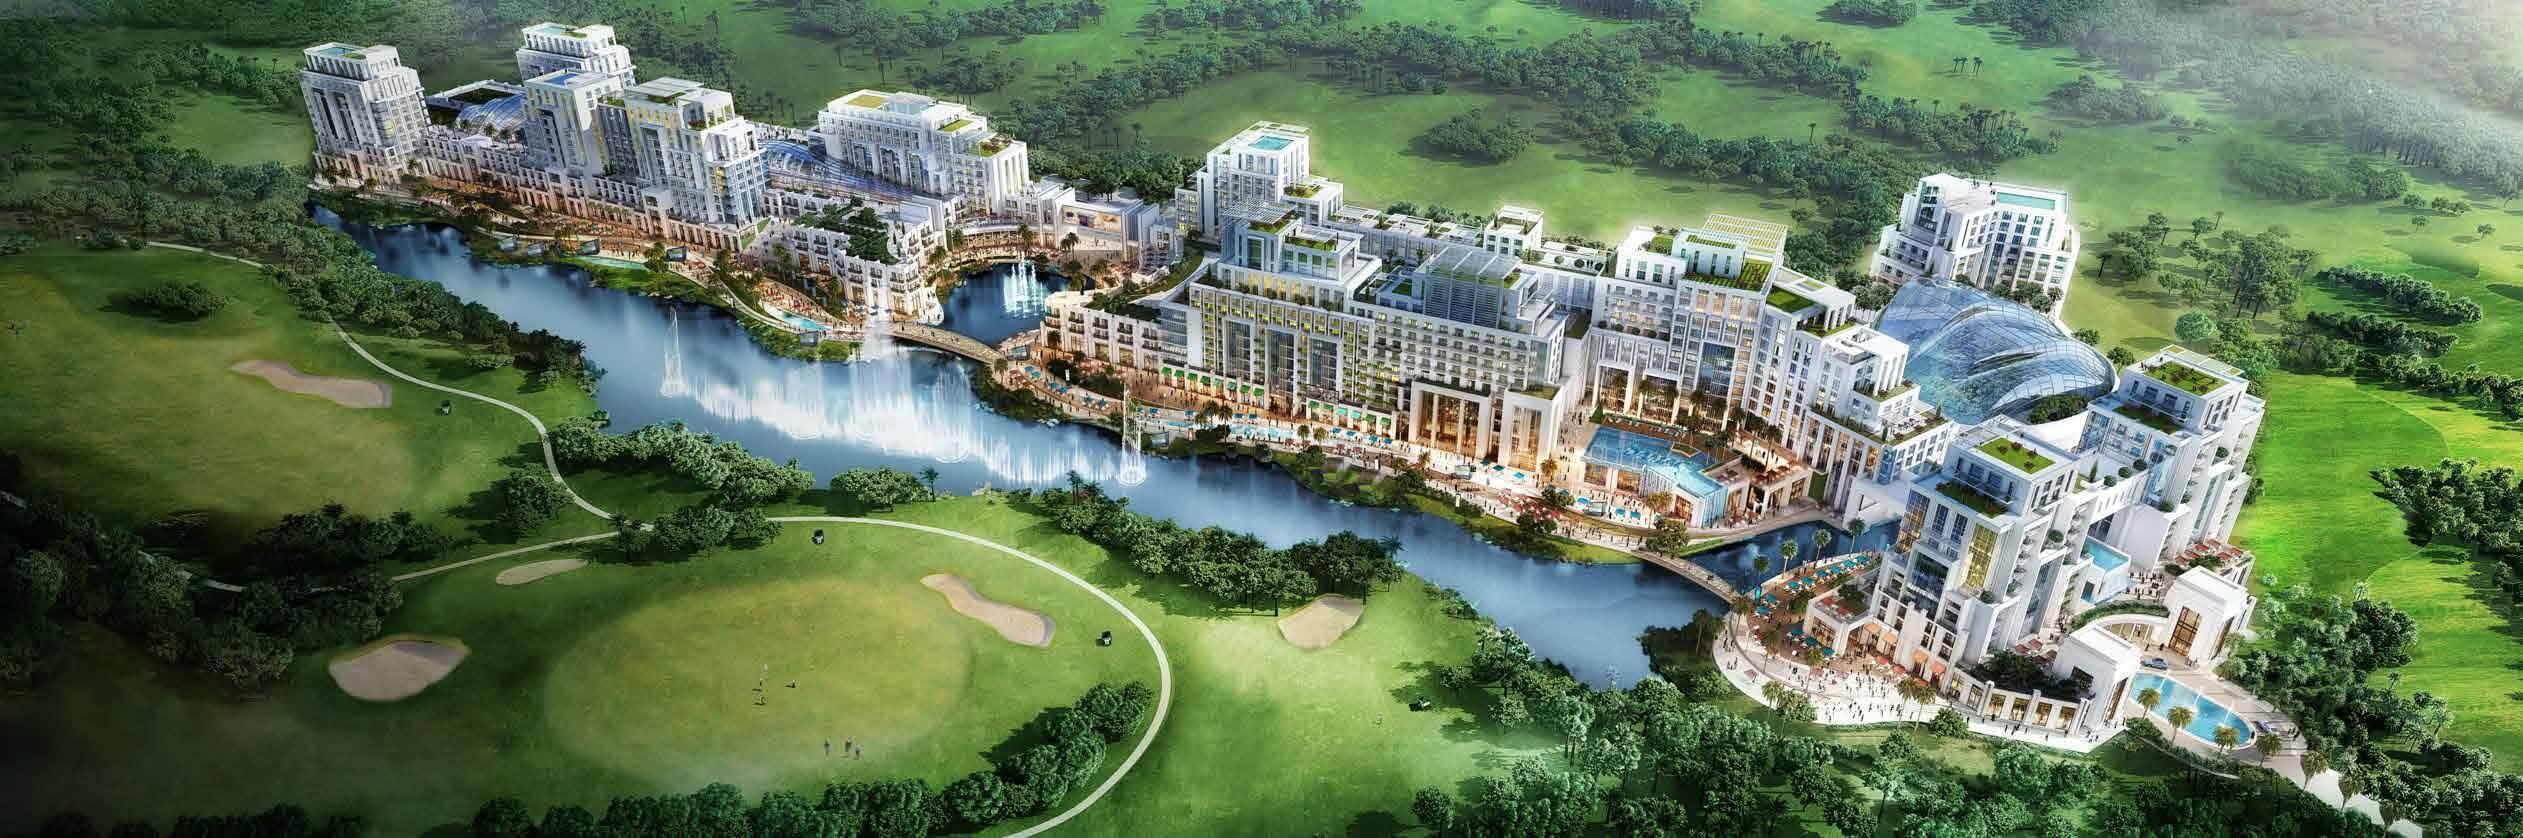 akoya imagine 2 amenities features6